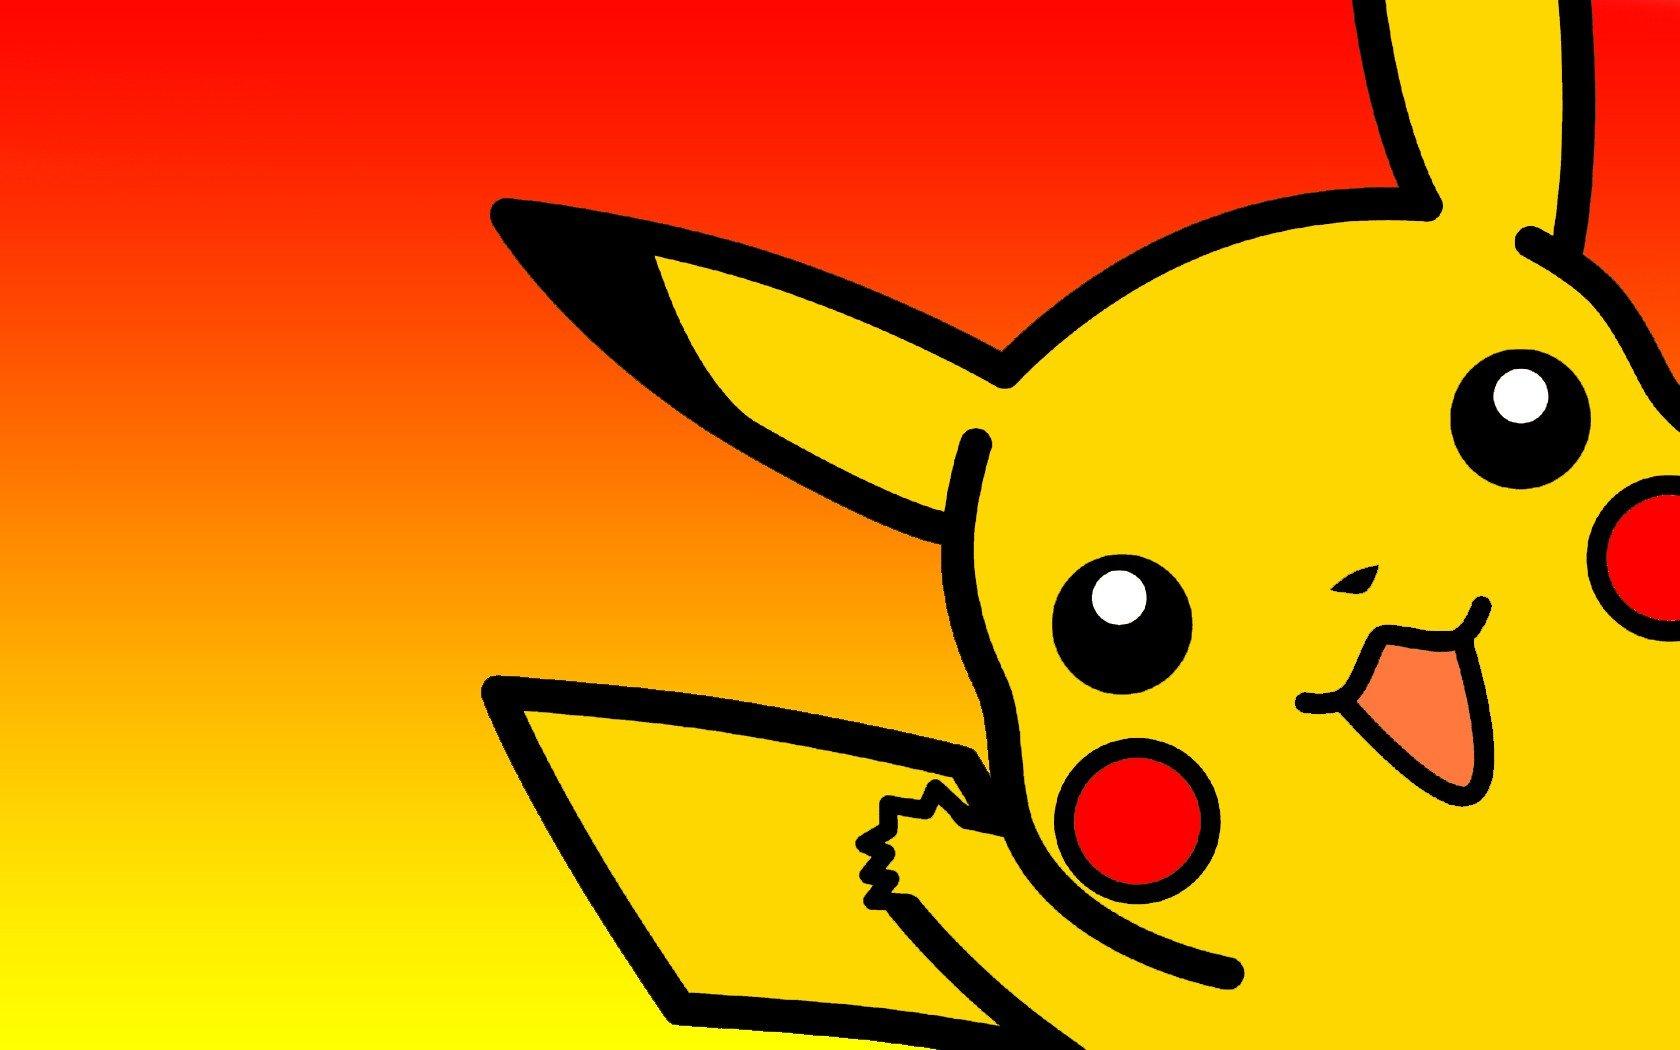 Fond d'écran : 1680x1050 px, Pikachu, Pokémon 1680x1050 ...